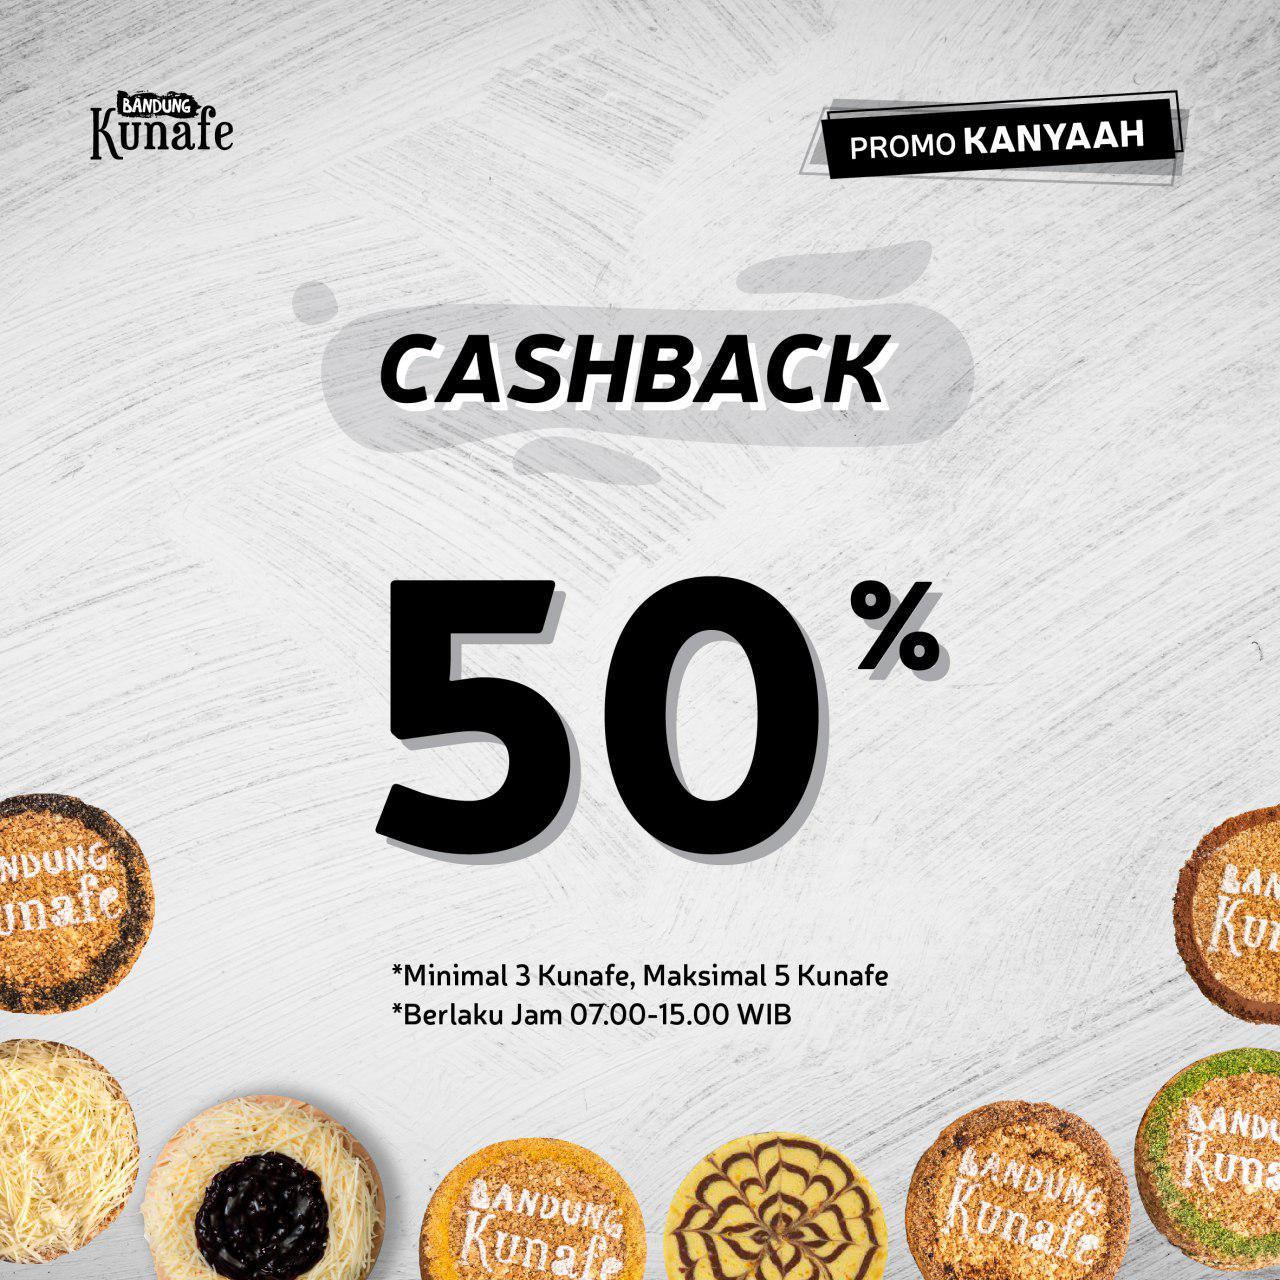 Promo Kanyaah Cashback 50%